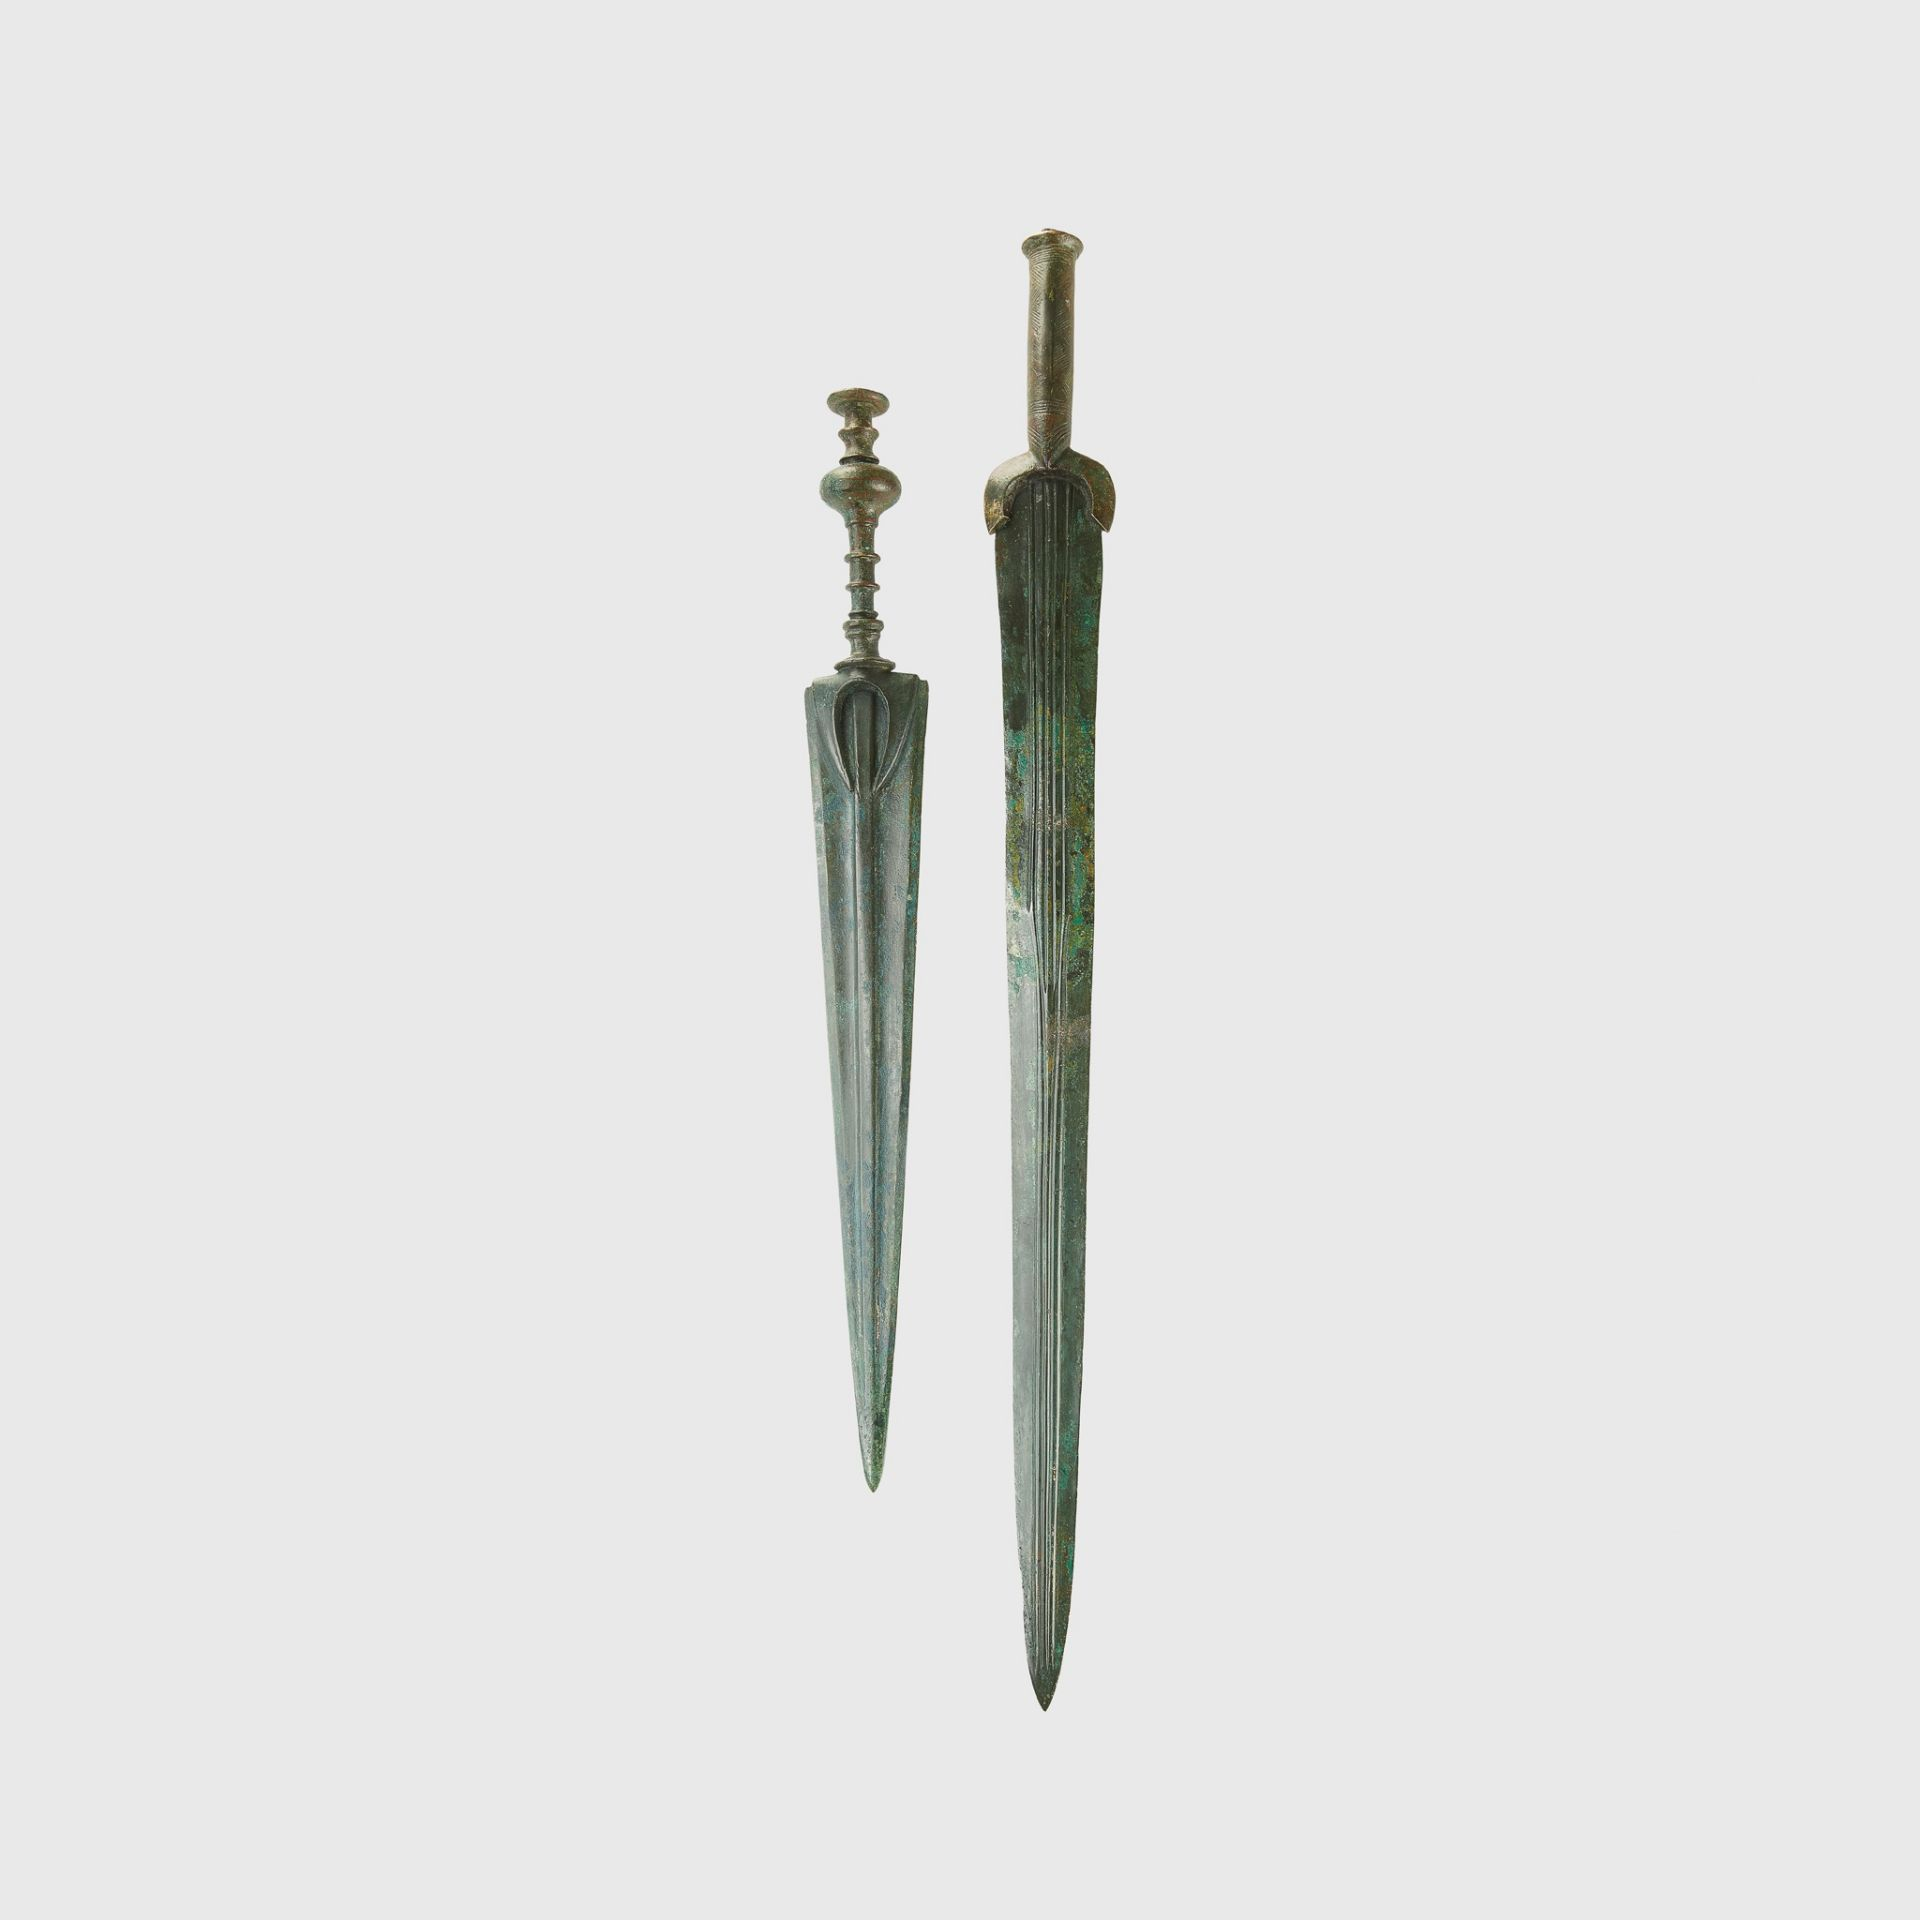 NEAR EASTERN DAGGER AND SWORD NEAR EAST, EARLY FIRST MILLENNIUM B.C.